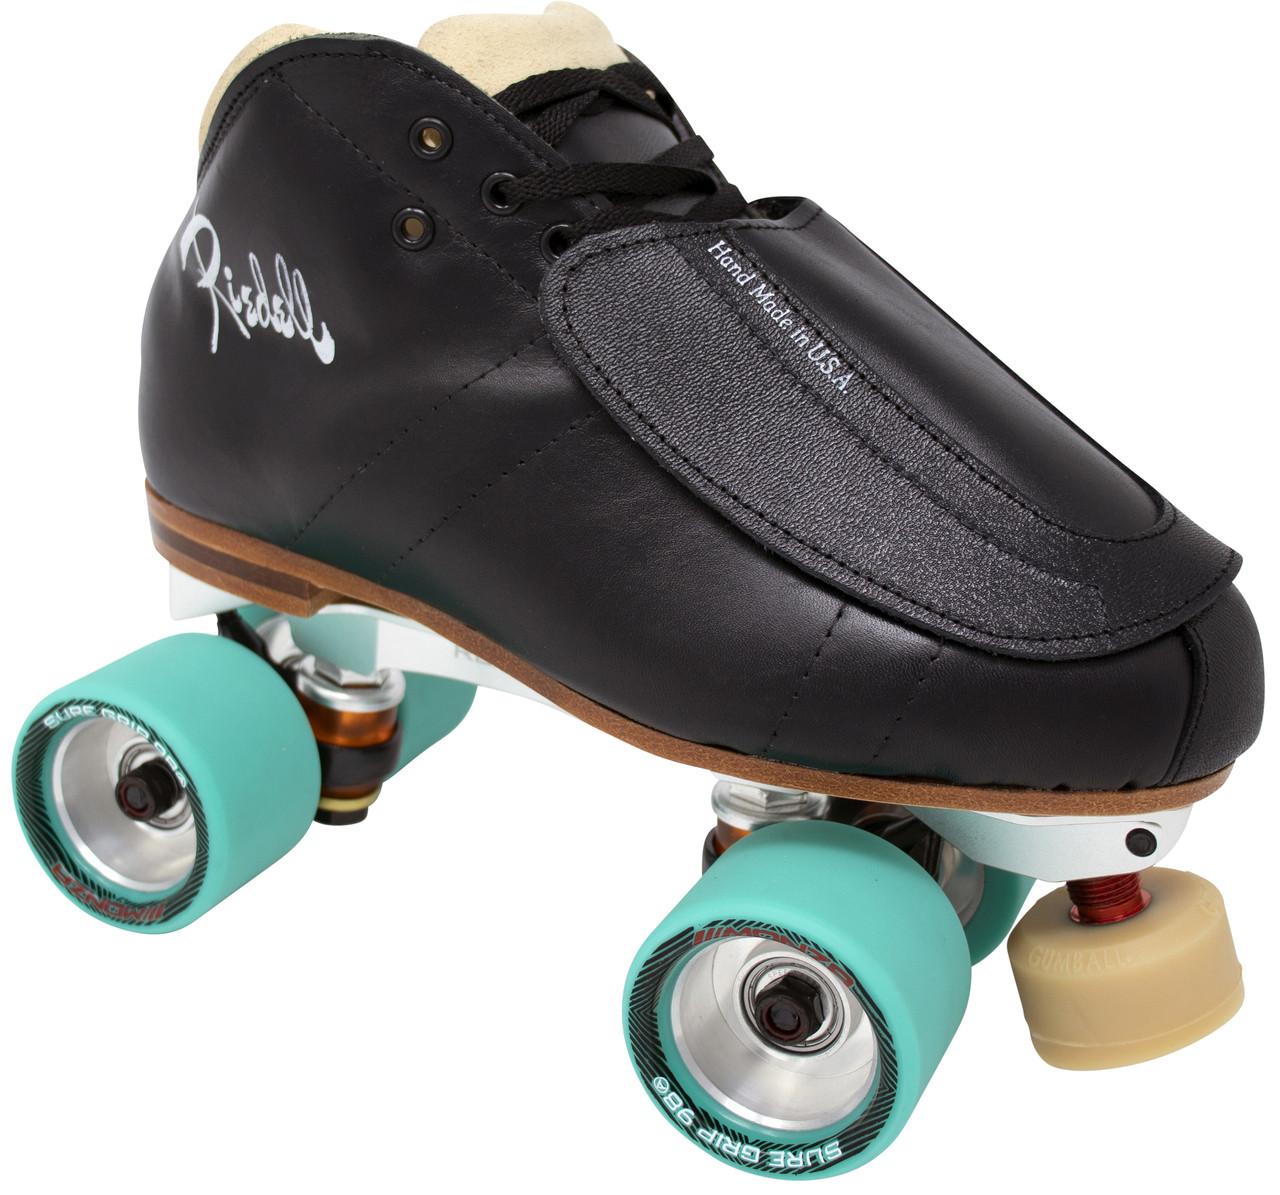 Skates For Sale >> Riedell Quad Skates Riedell Roller Skates For Sale